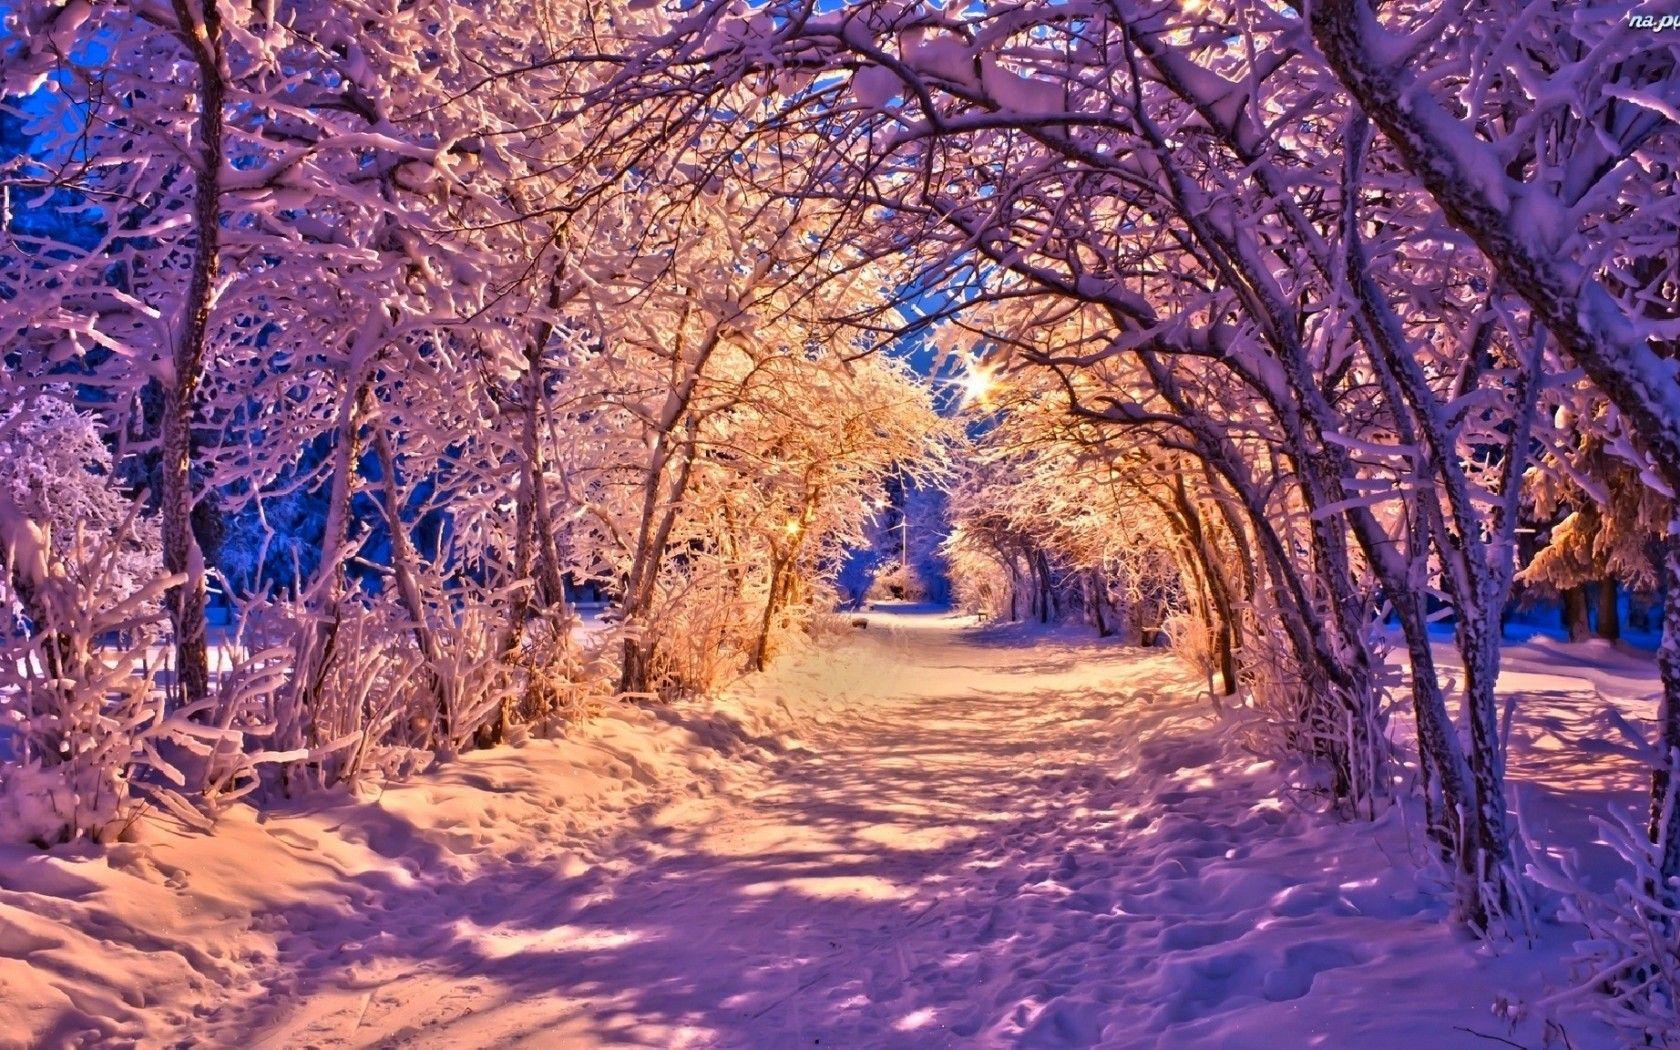 Download Wallpaper Nature Winter Bench Park Lanterns Lights Snow Road Trees Nature Resolution 1680x105 Winter Landscape Winter Wallpaper Winter Scenes Hd wallpaper winter nature forest path